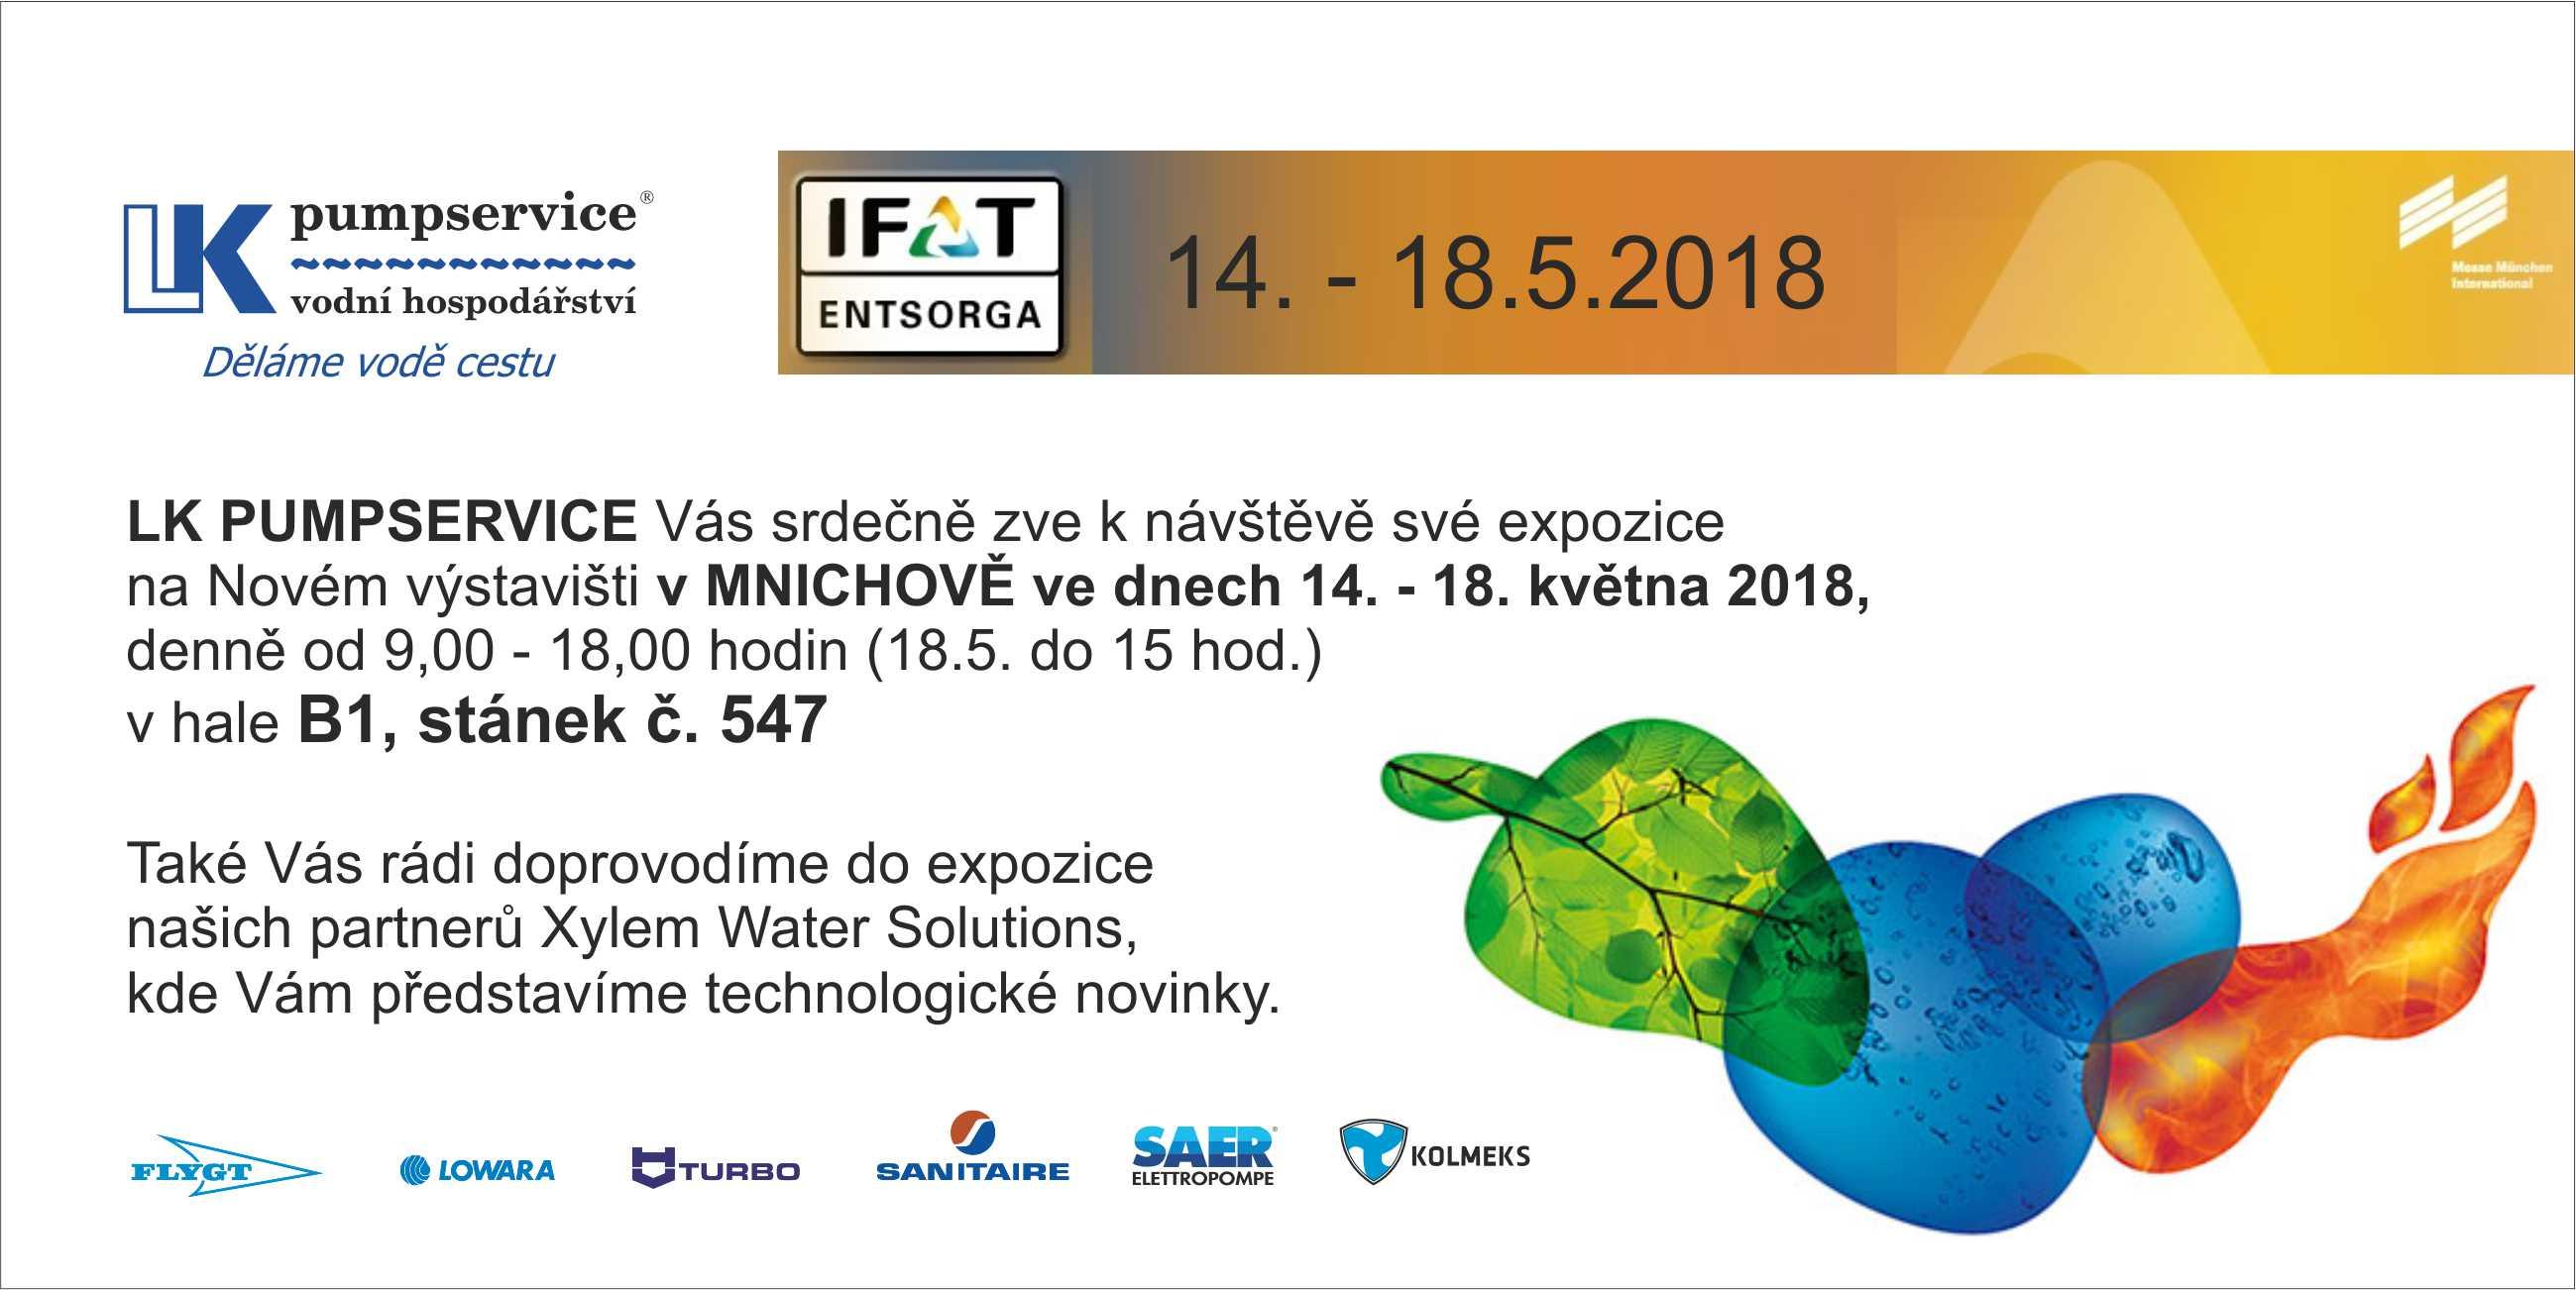 IFAT pozvánka